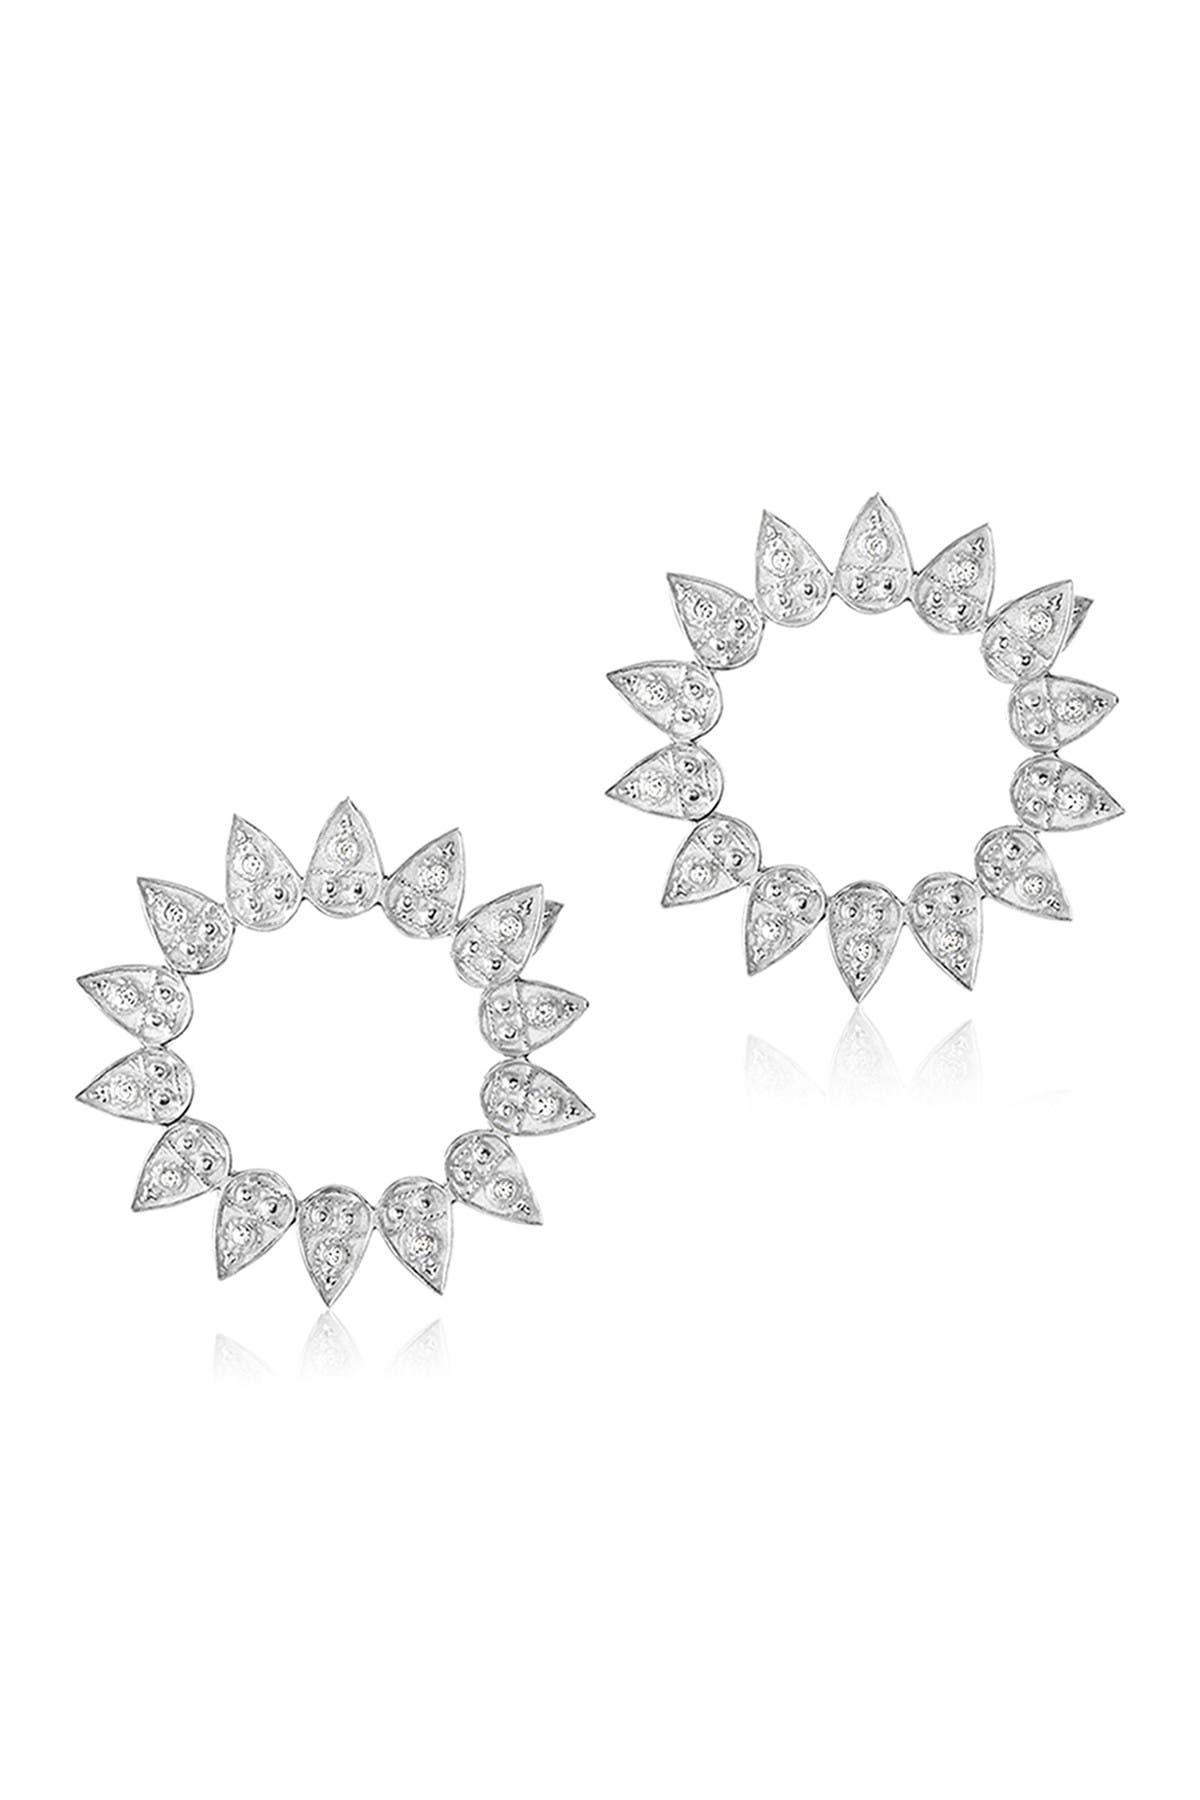 Image of LEGEND AMRAPALI SILVER Sterling Silver Heritage Petal White Diamond Circle Drop Earrings - 0.26 ctw